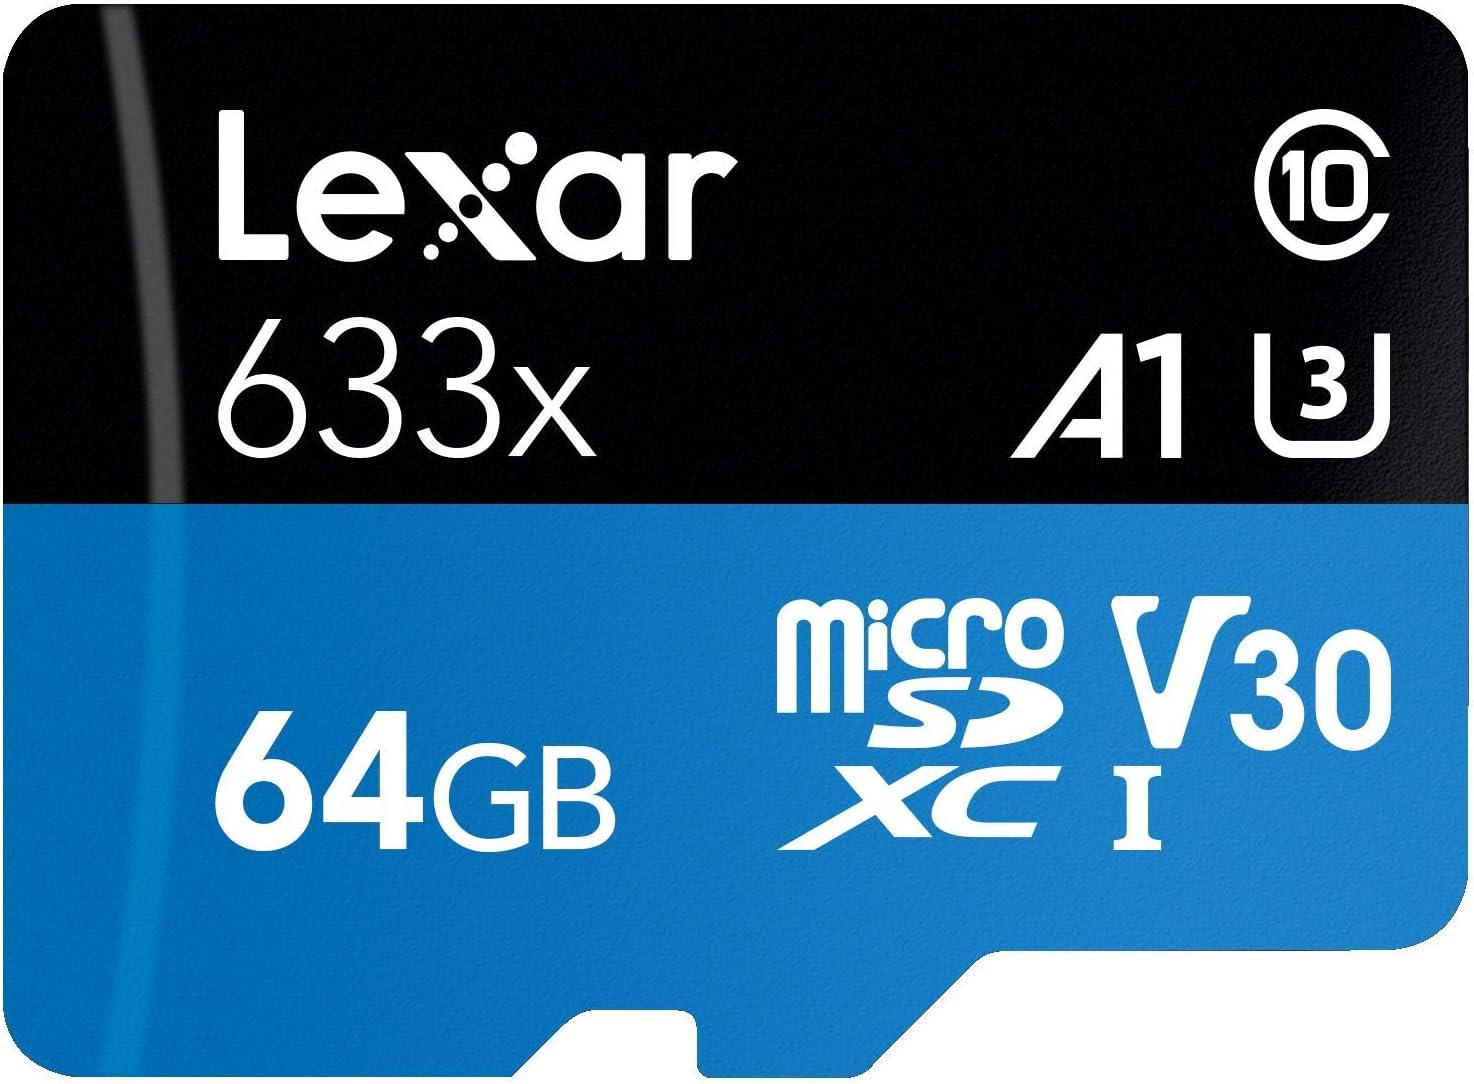 LSDMI512BBNL633A Lexar High-Performance 633x 512GB microSDXC UHS-I Card with SD Adapter